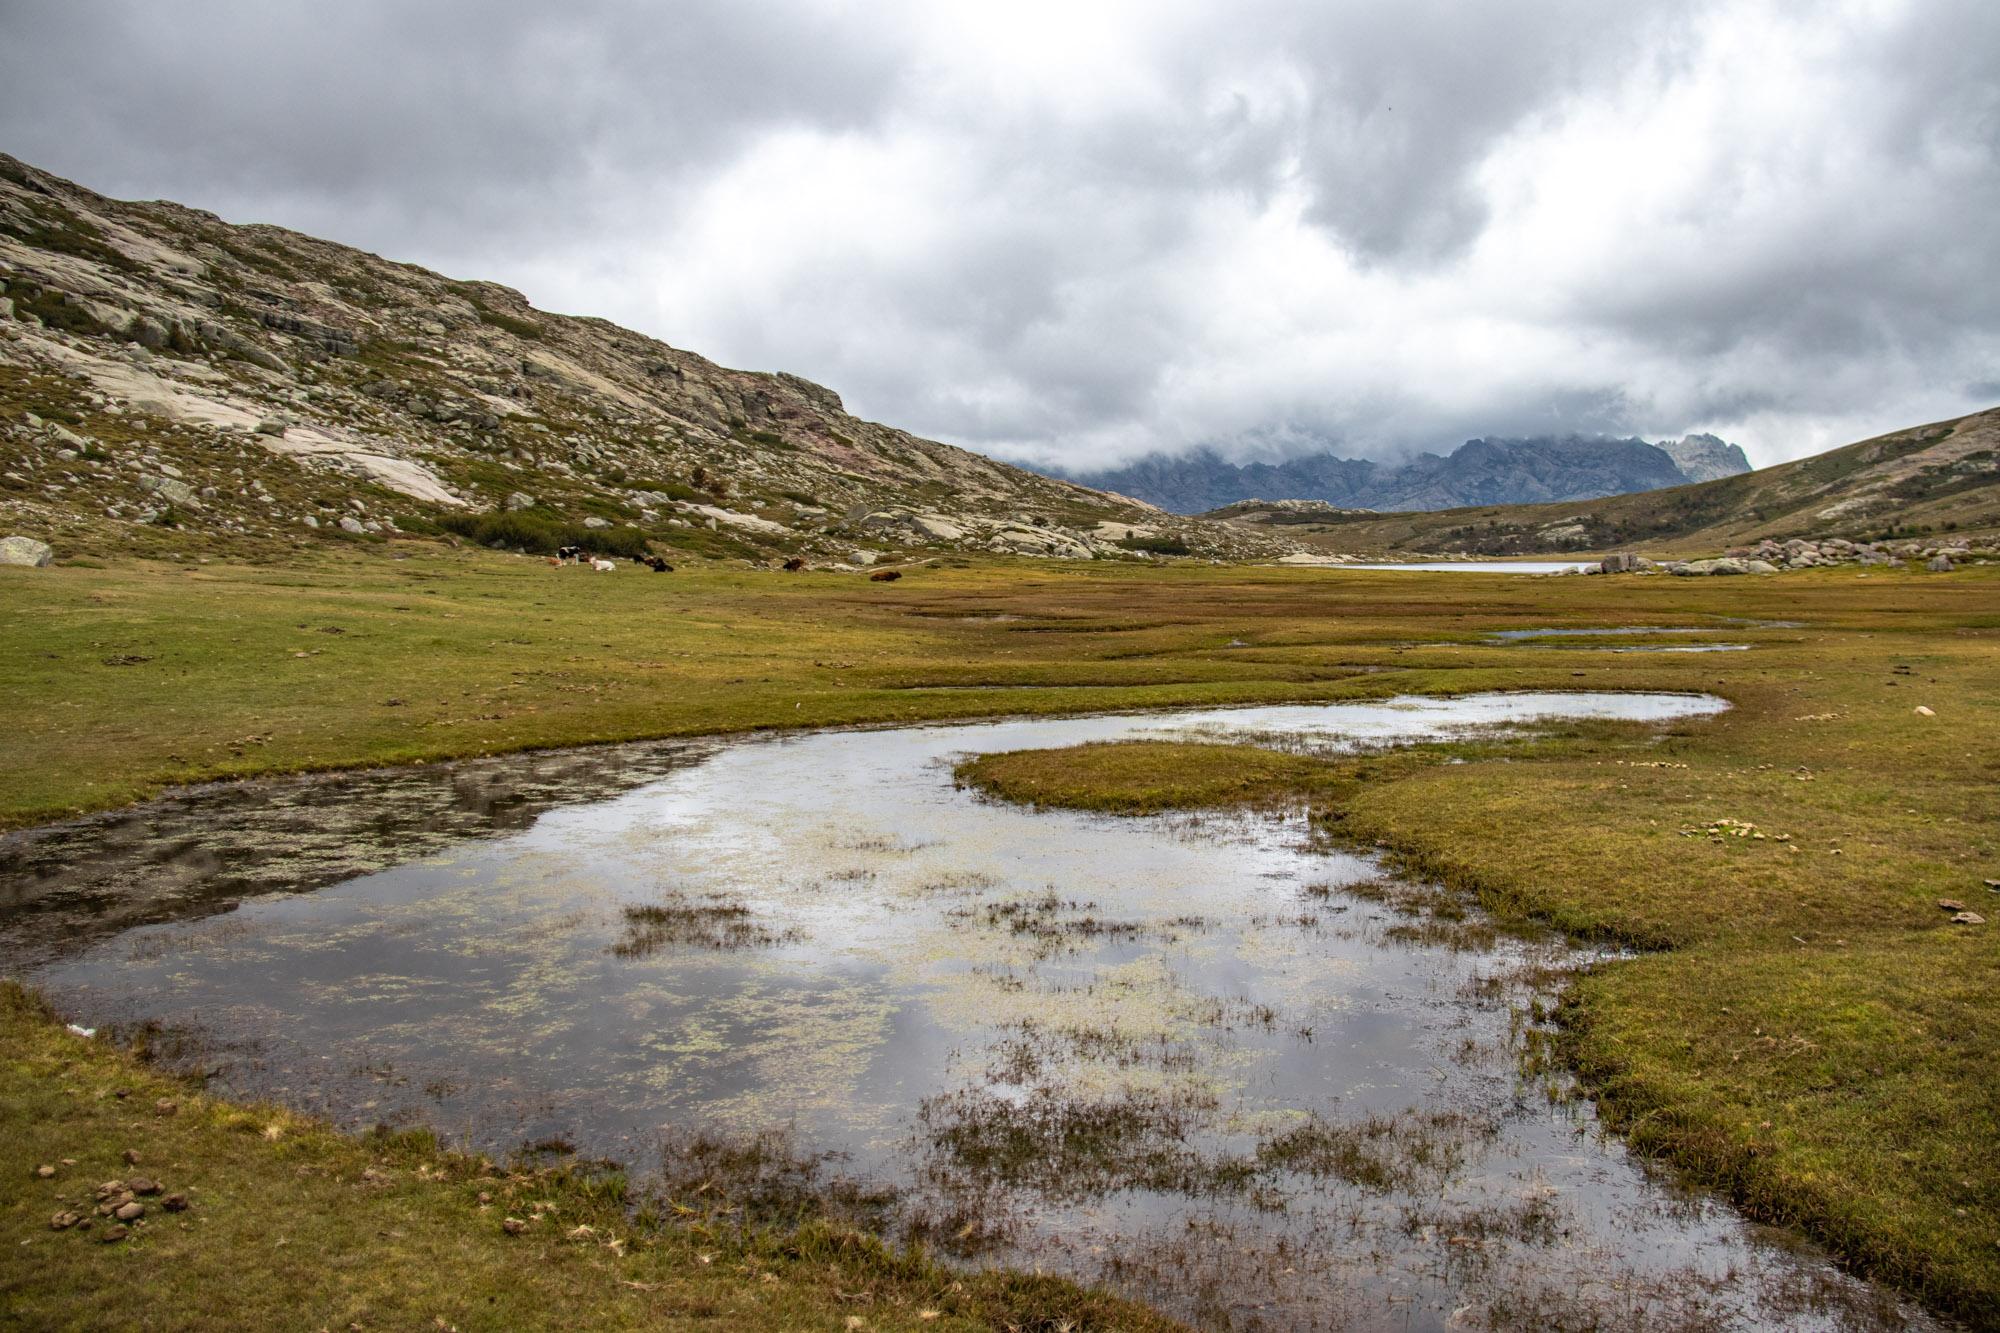 lac-de-nino-bergmeer-corsica